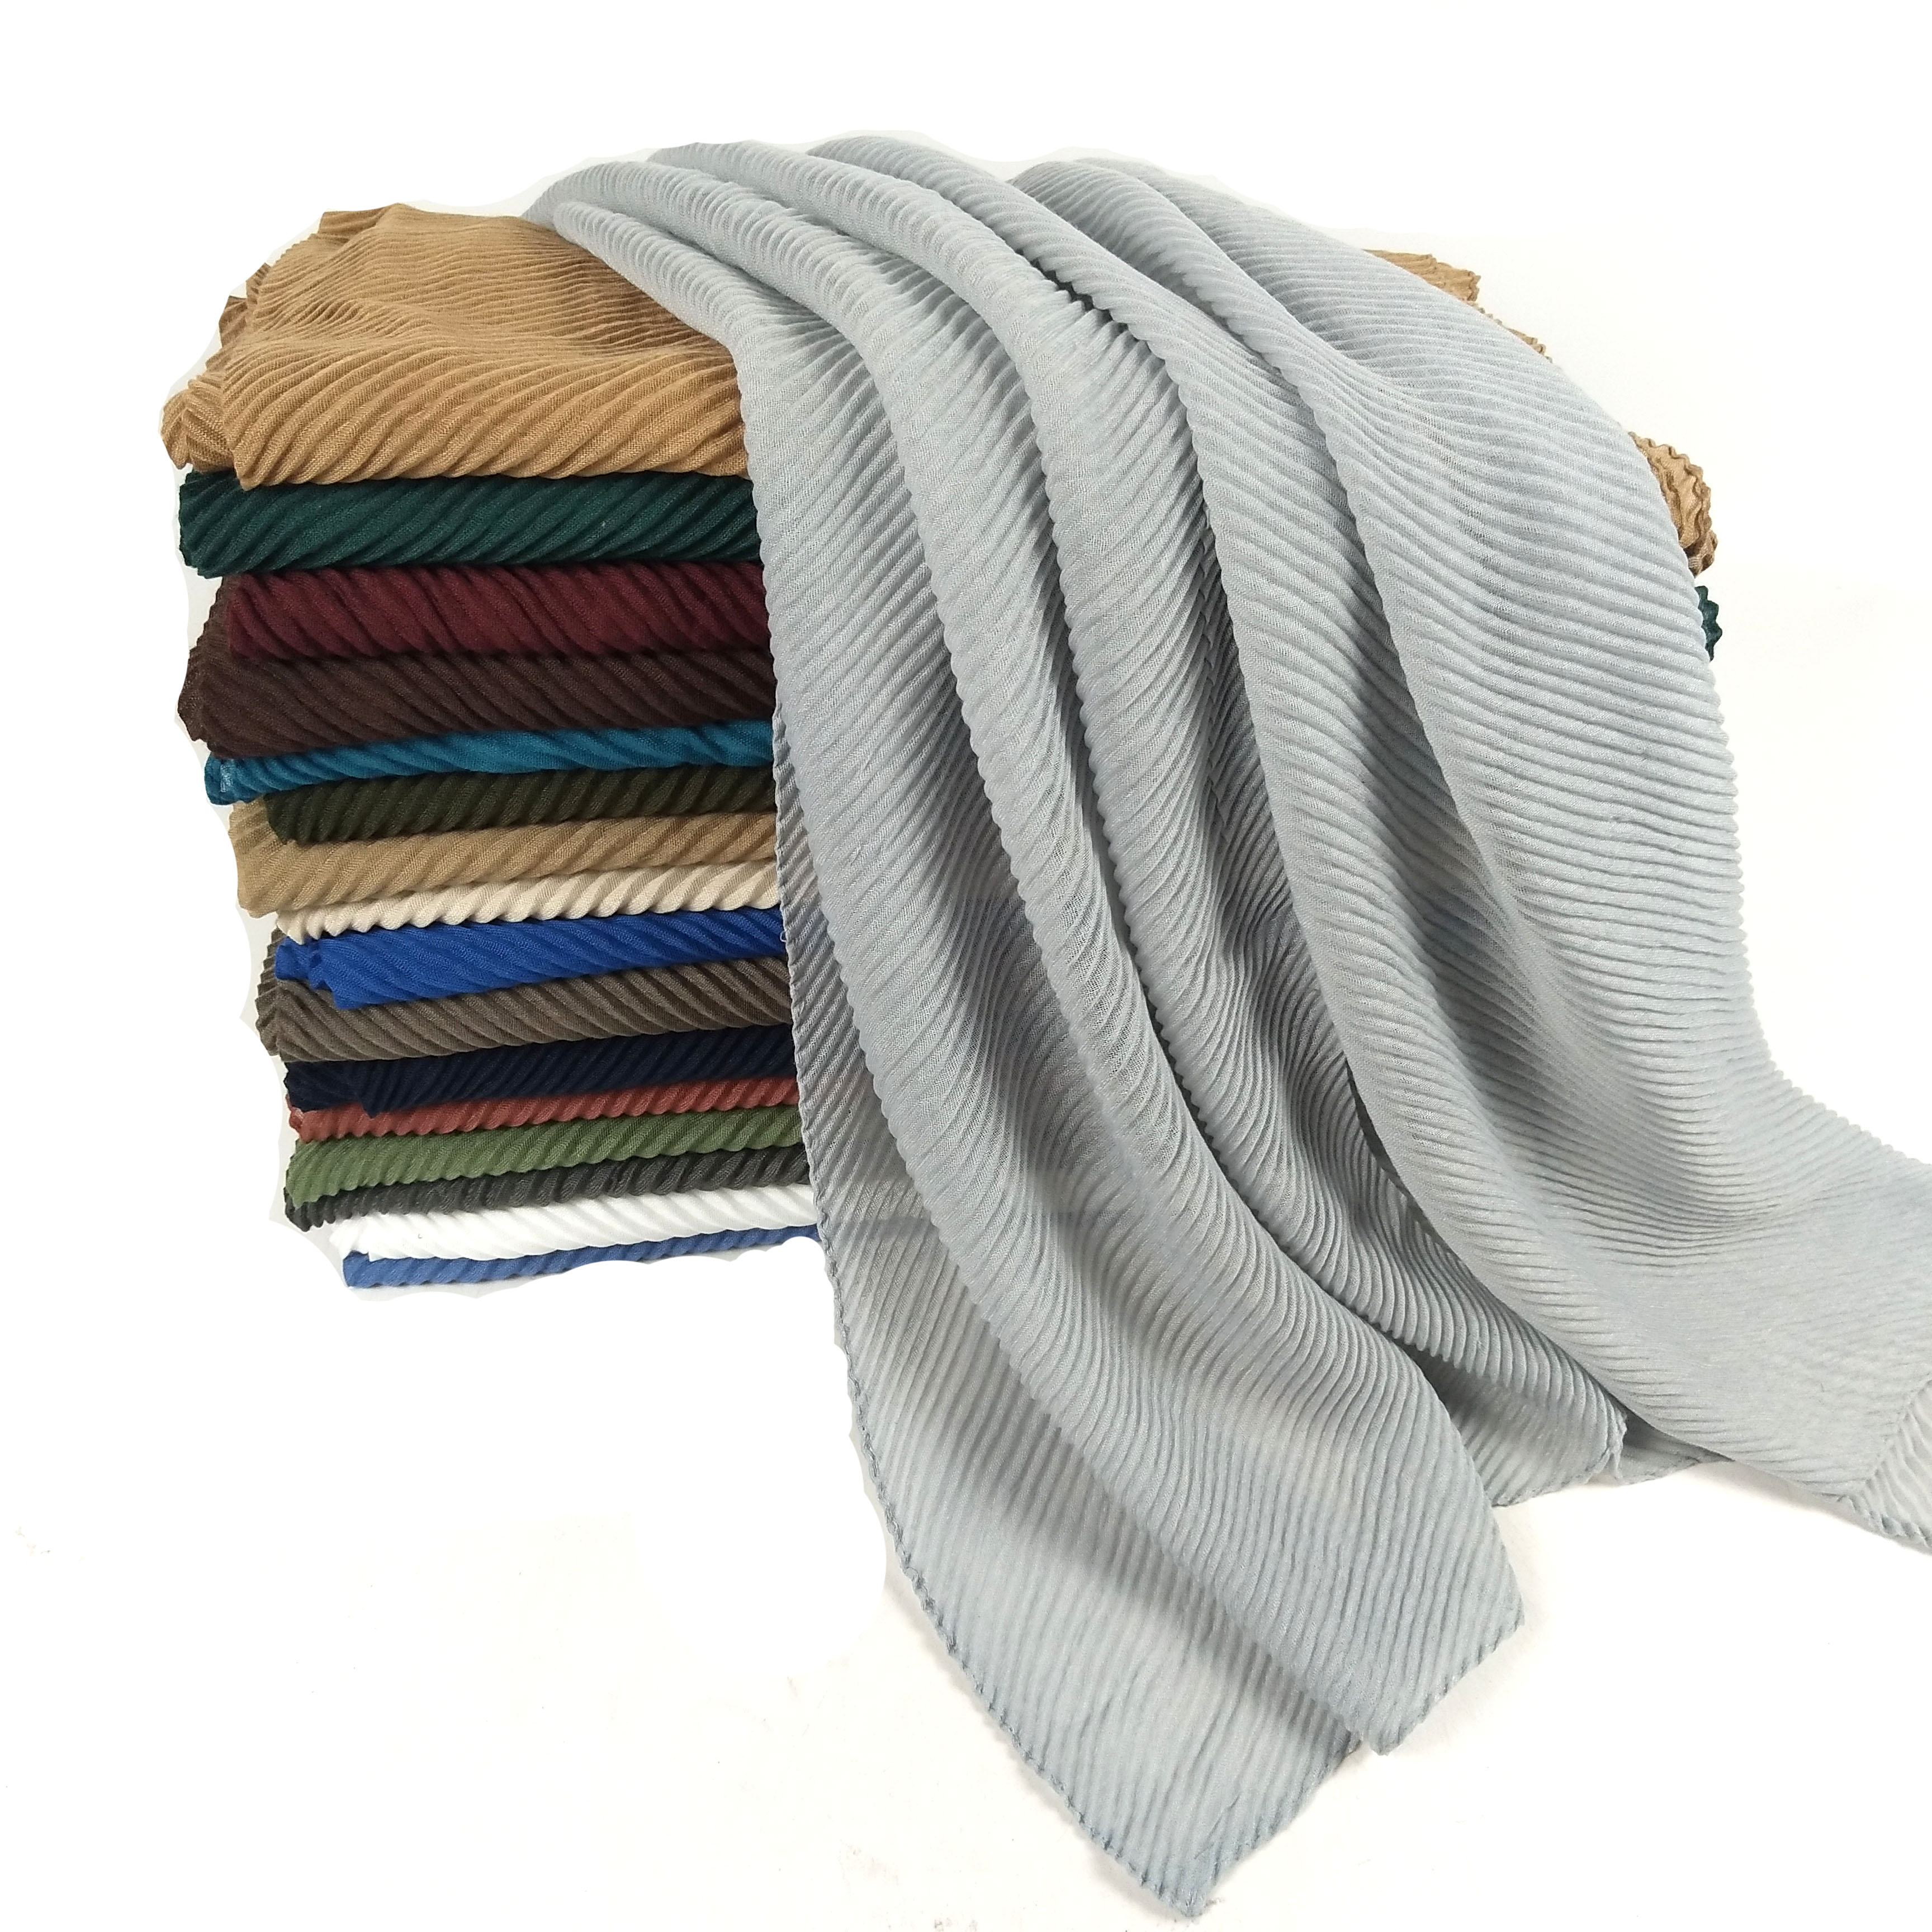 V1 10pcs High Quality Crumple Crinkle Hijab Wrap Cotton Viscose  Headband Lady Scarf Scarves Shawl Shawls